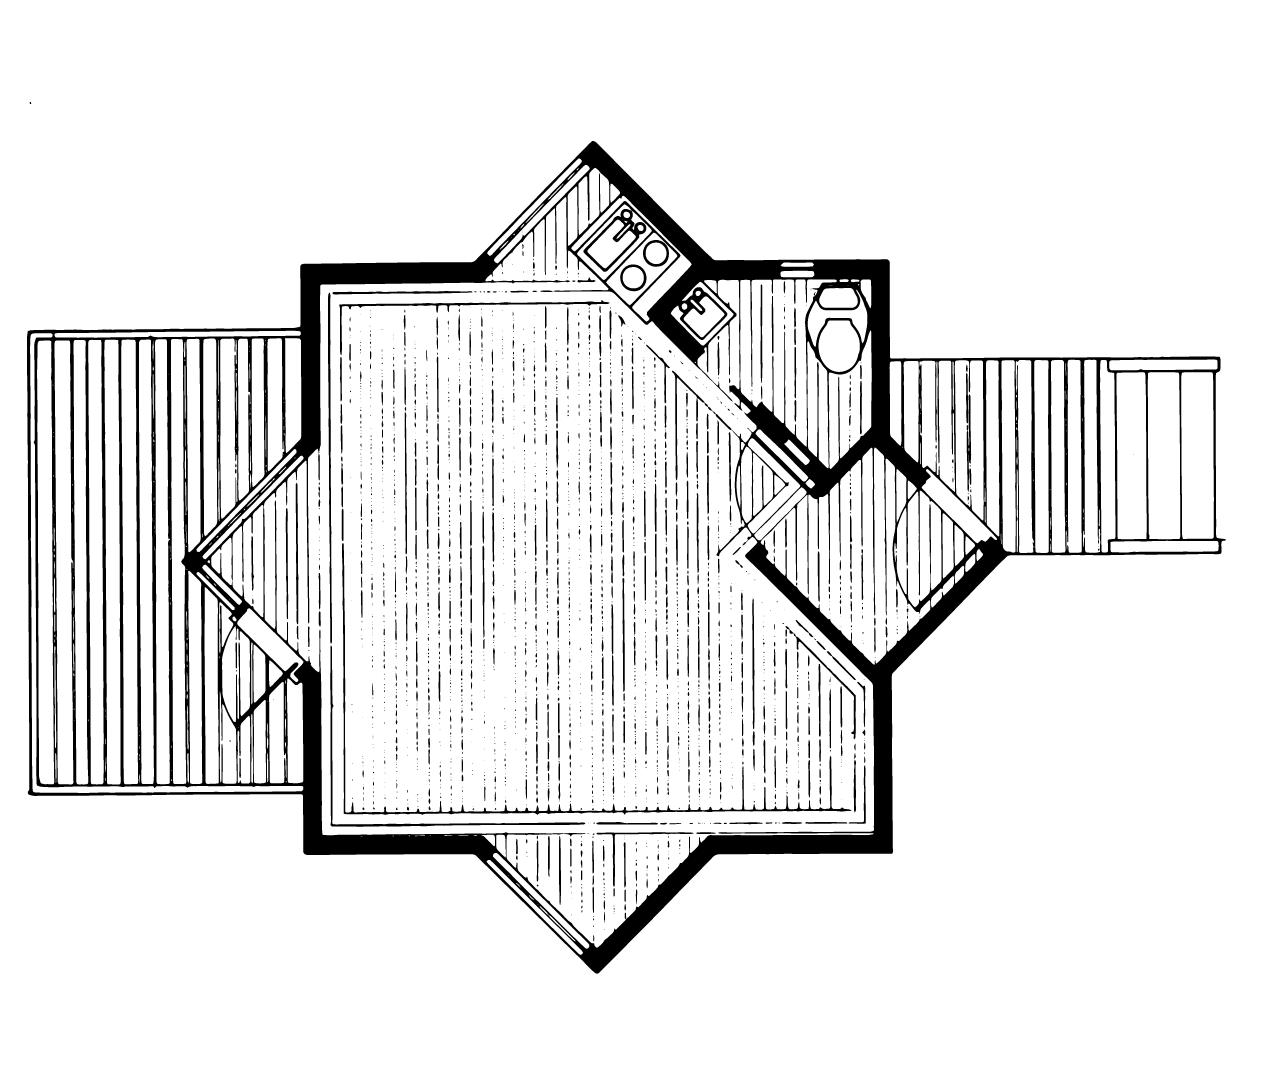 The Davidson Studio Floorplan